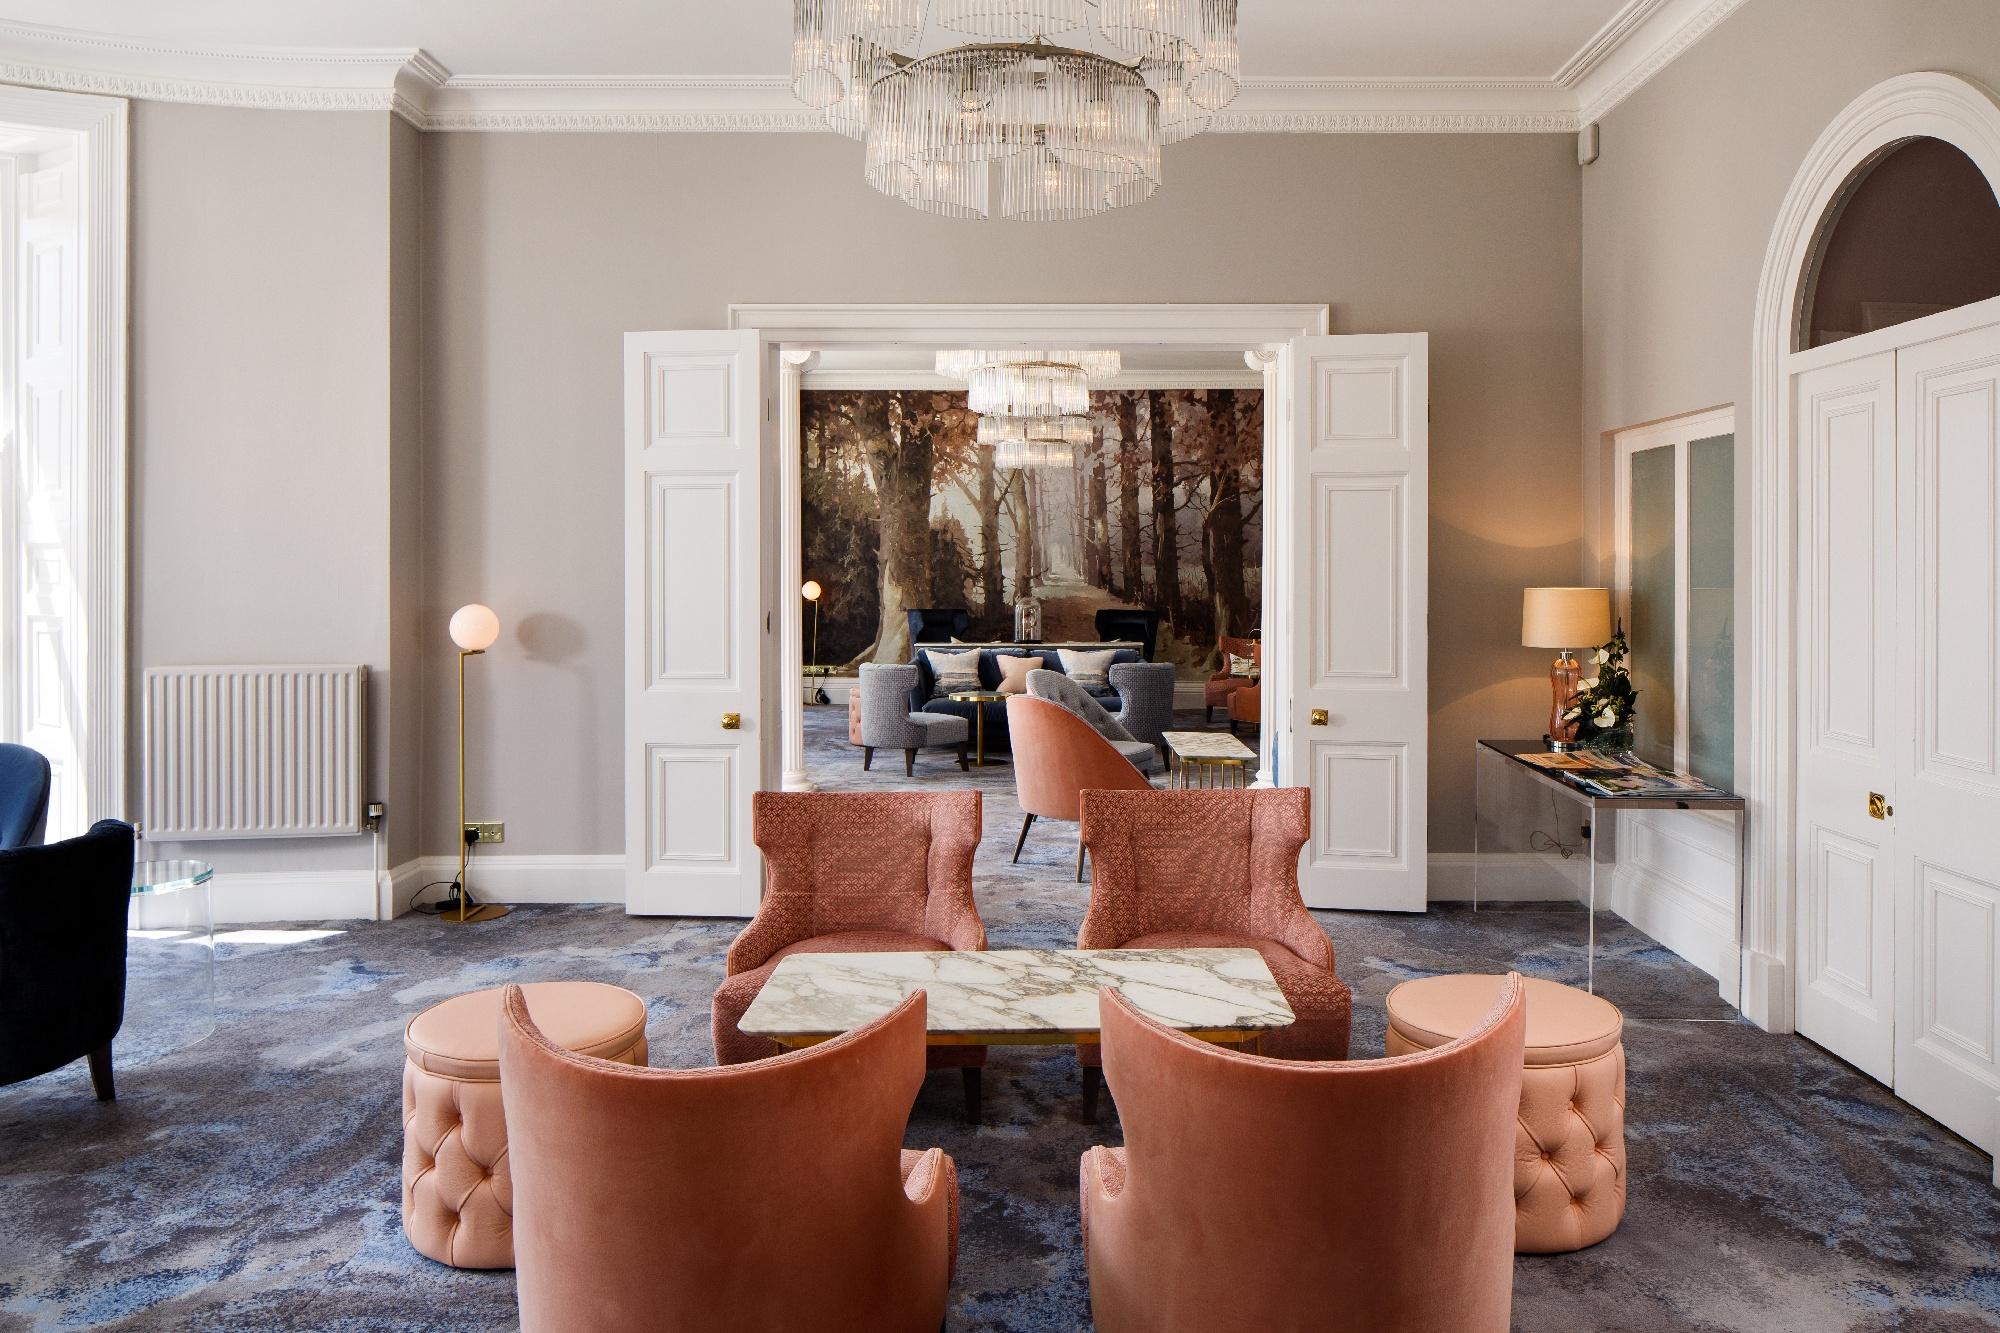 poufs bowden hall hotel gloucester